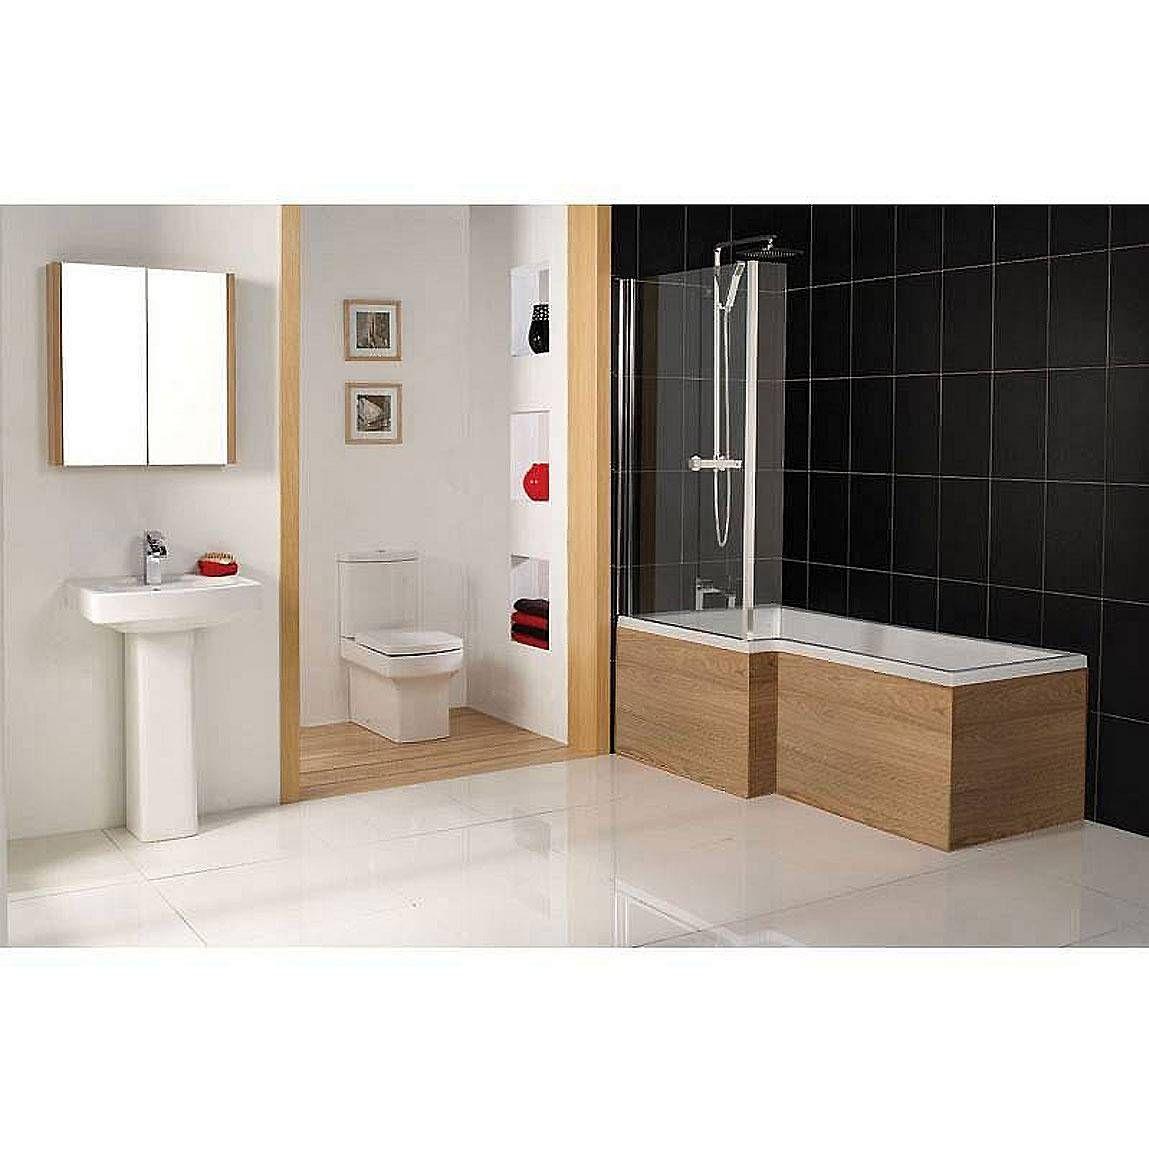 Cambridge Square Shower Bath Panel Oak - Victoria Plumb | Bathroom ...